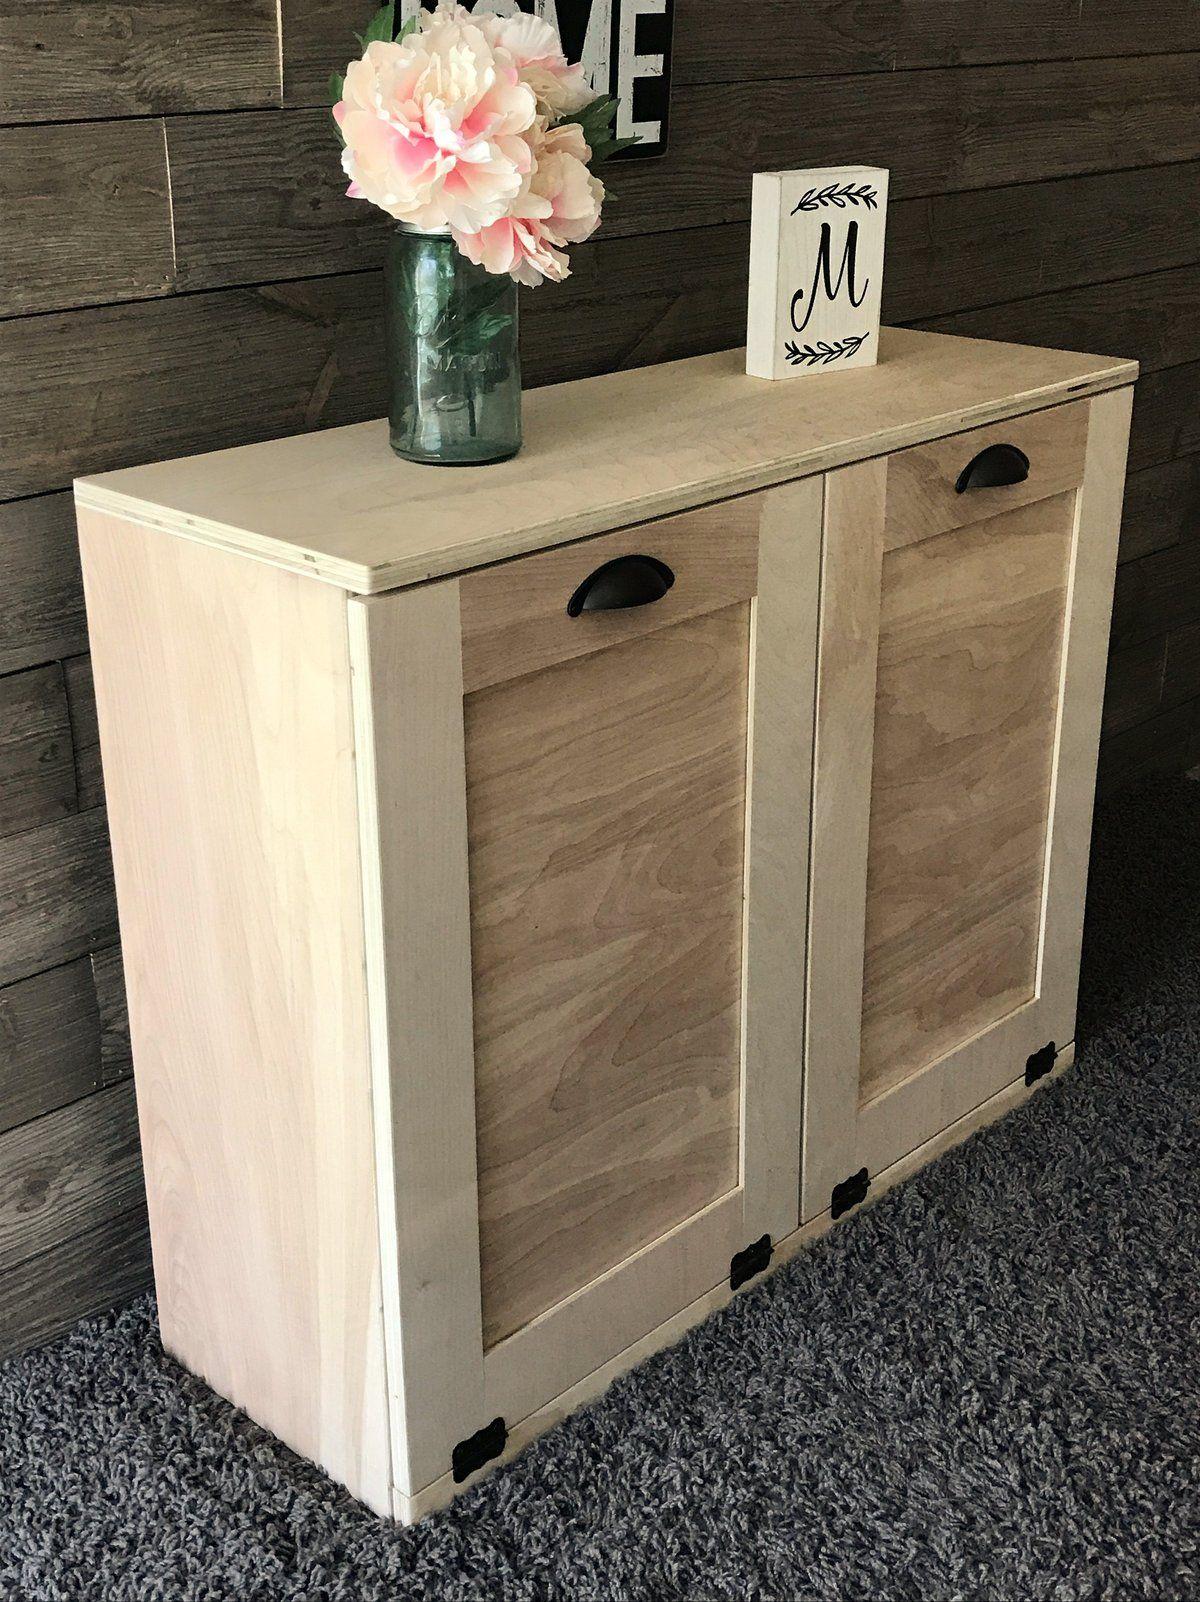 tilt out trash double bin unfinished DIY (D-RAW) | Easy ...